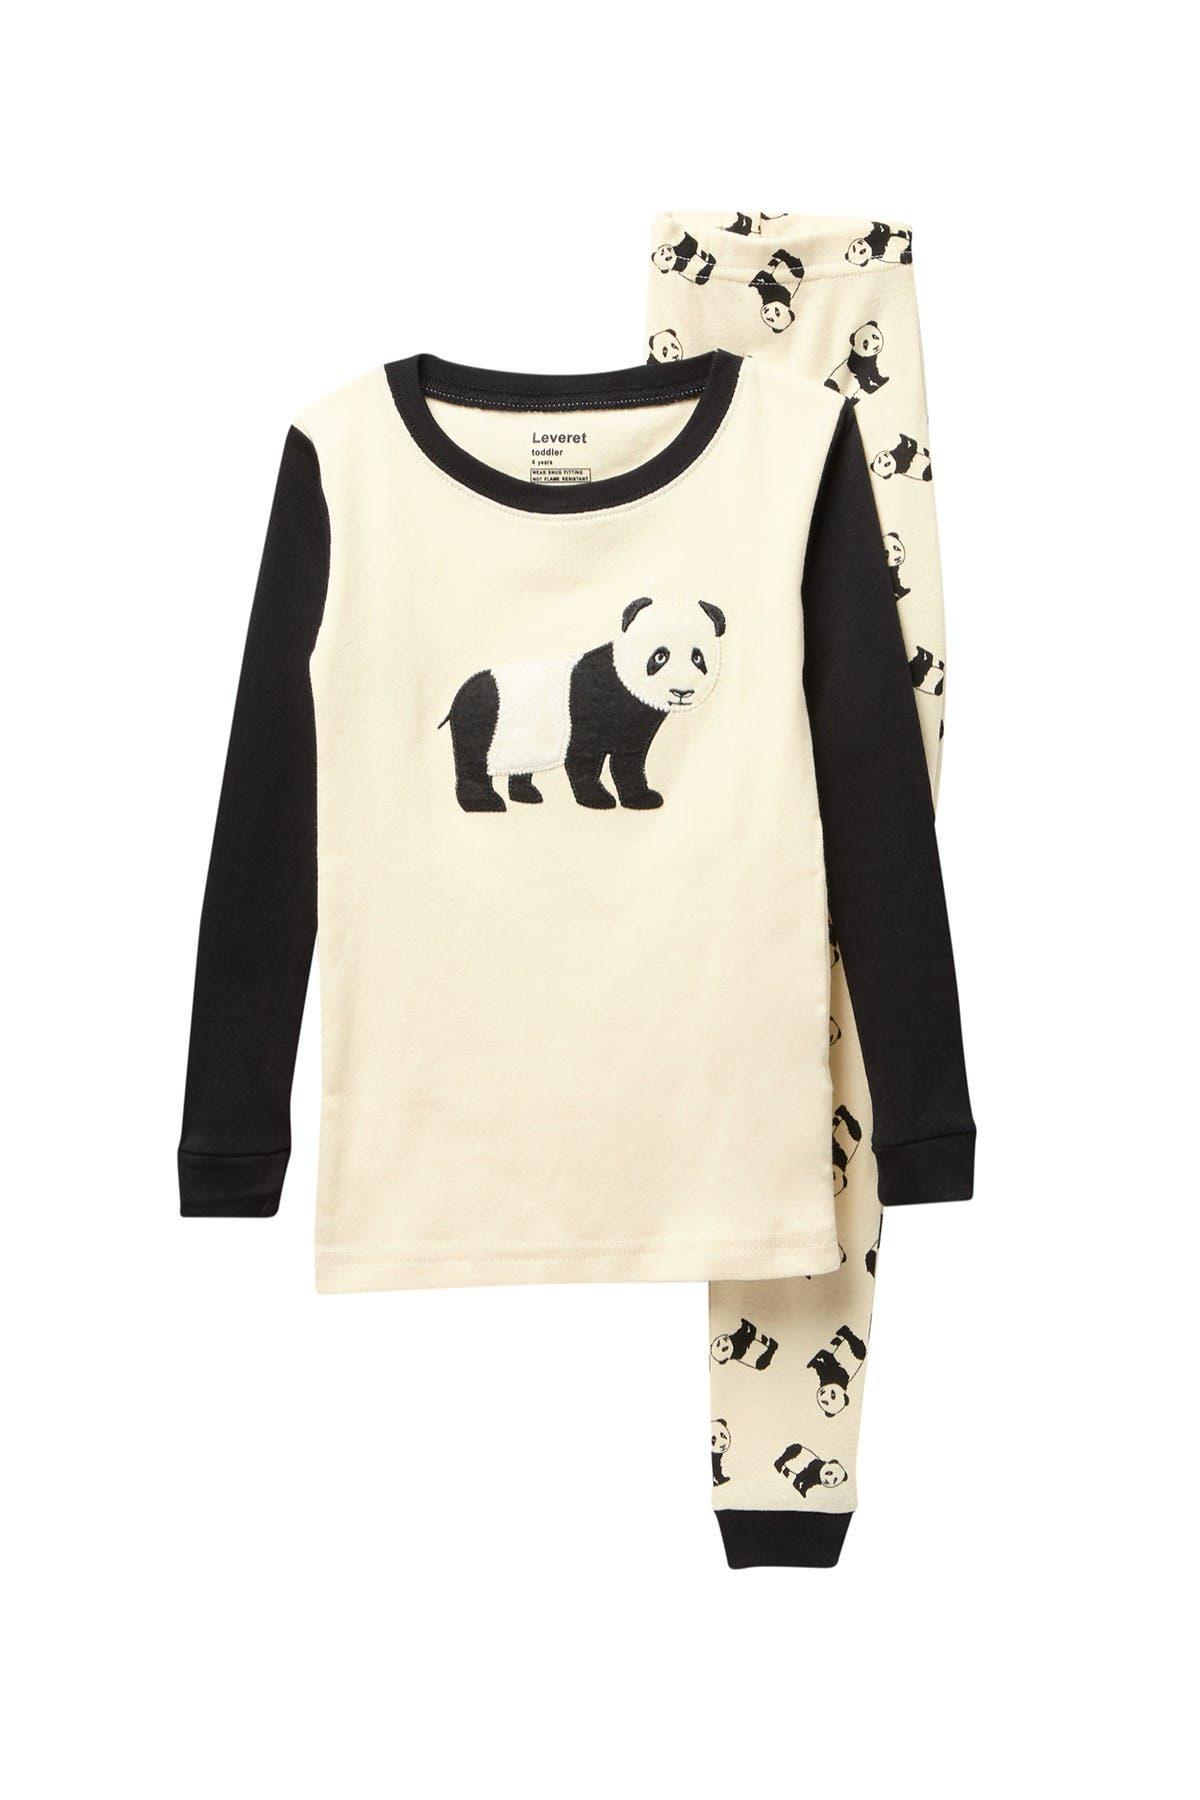 Image of Leveret Panda 2-Piece Pajama Set